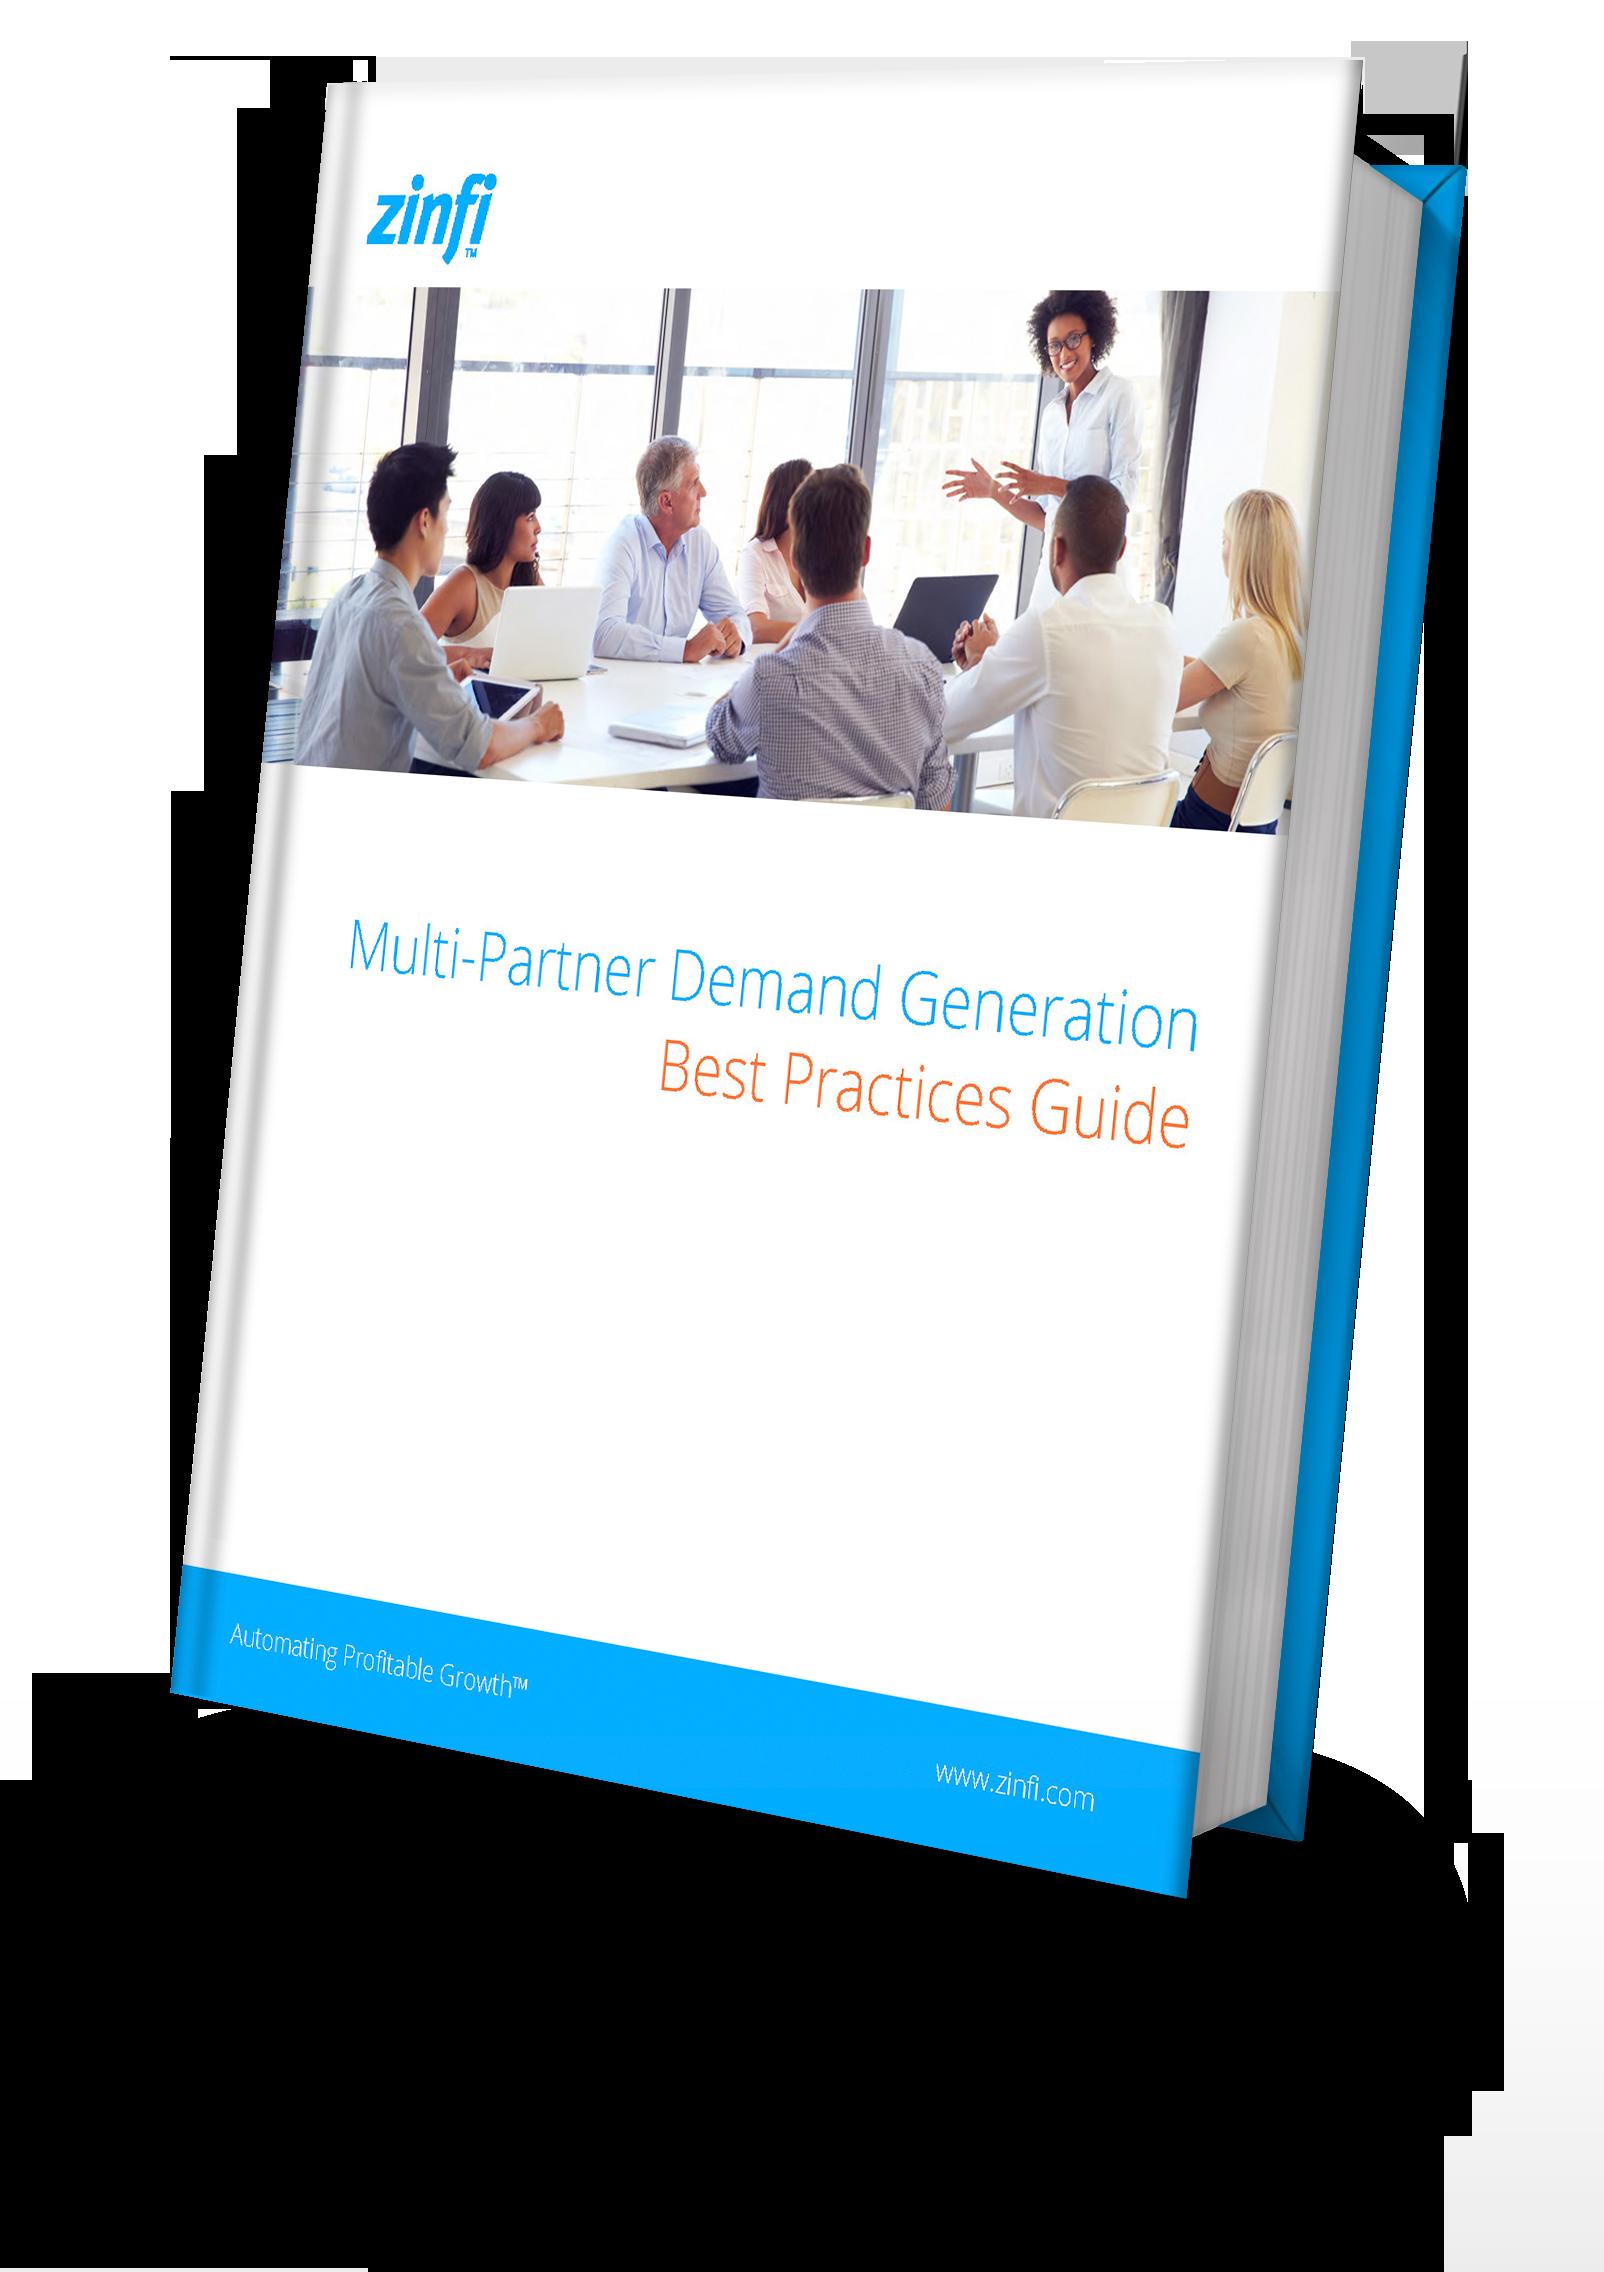 Multi-Partner Demand Generation Best Practices